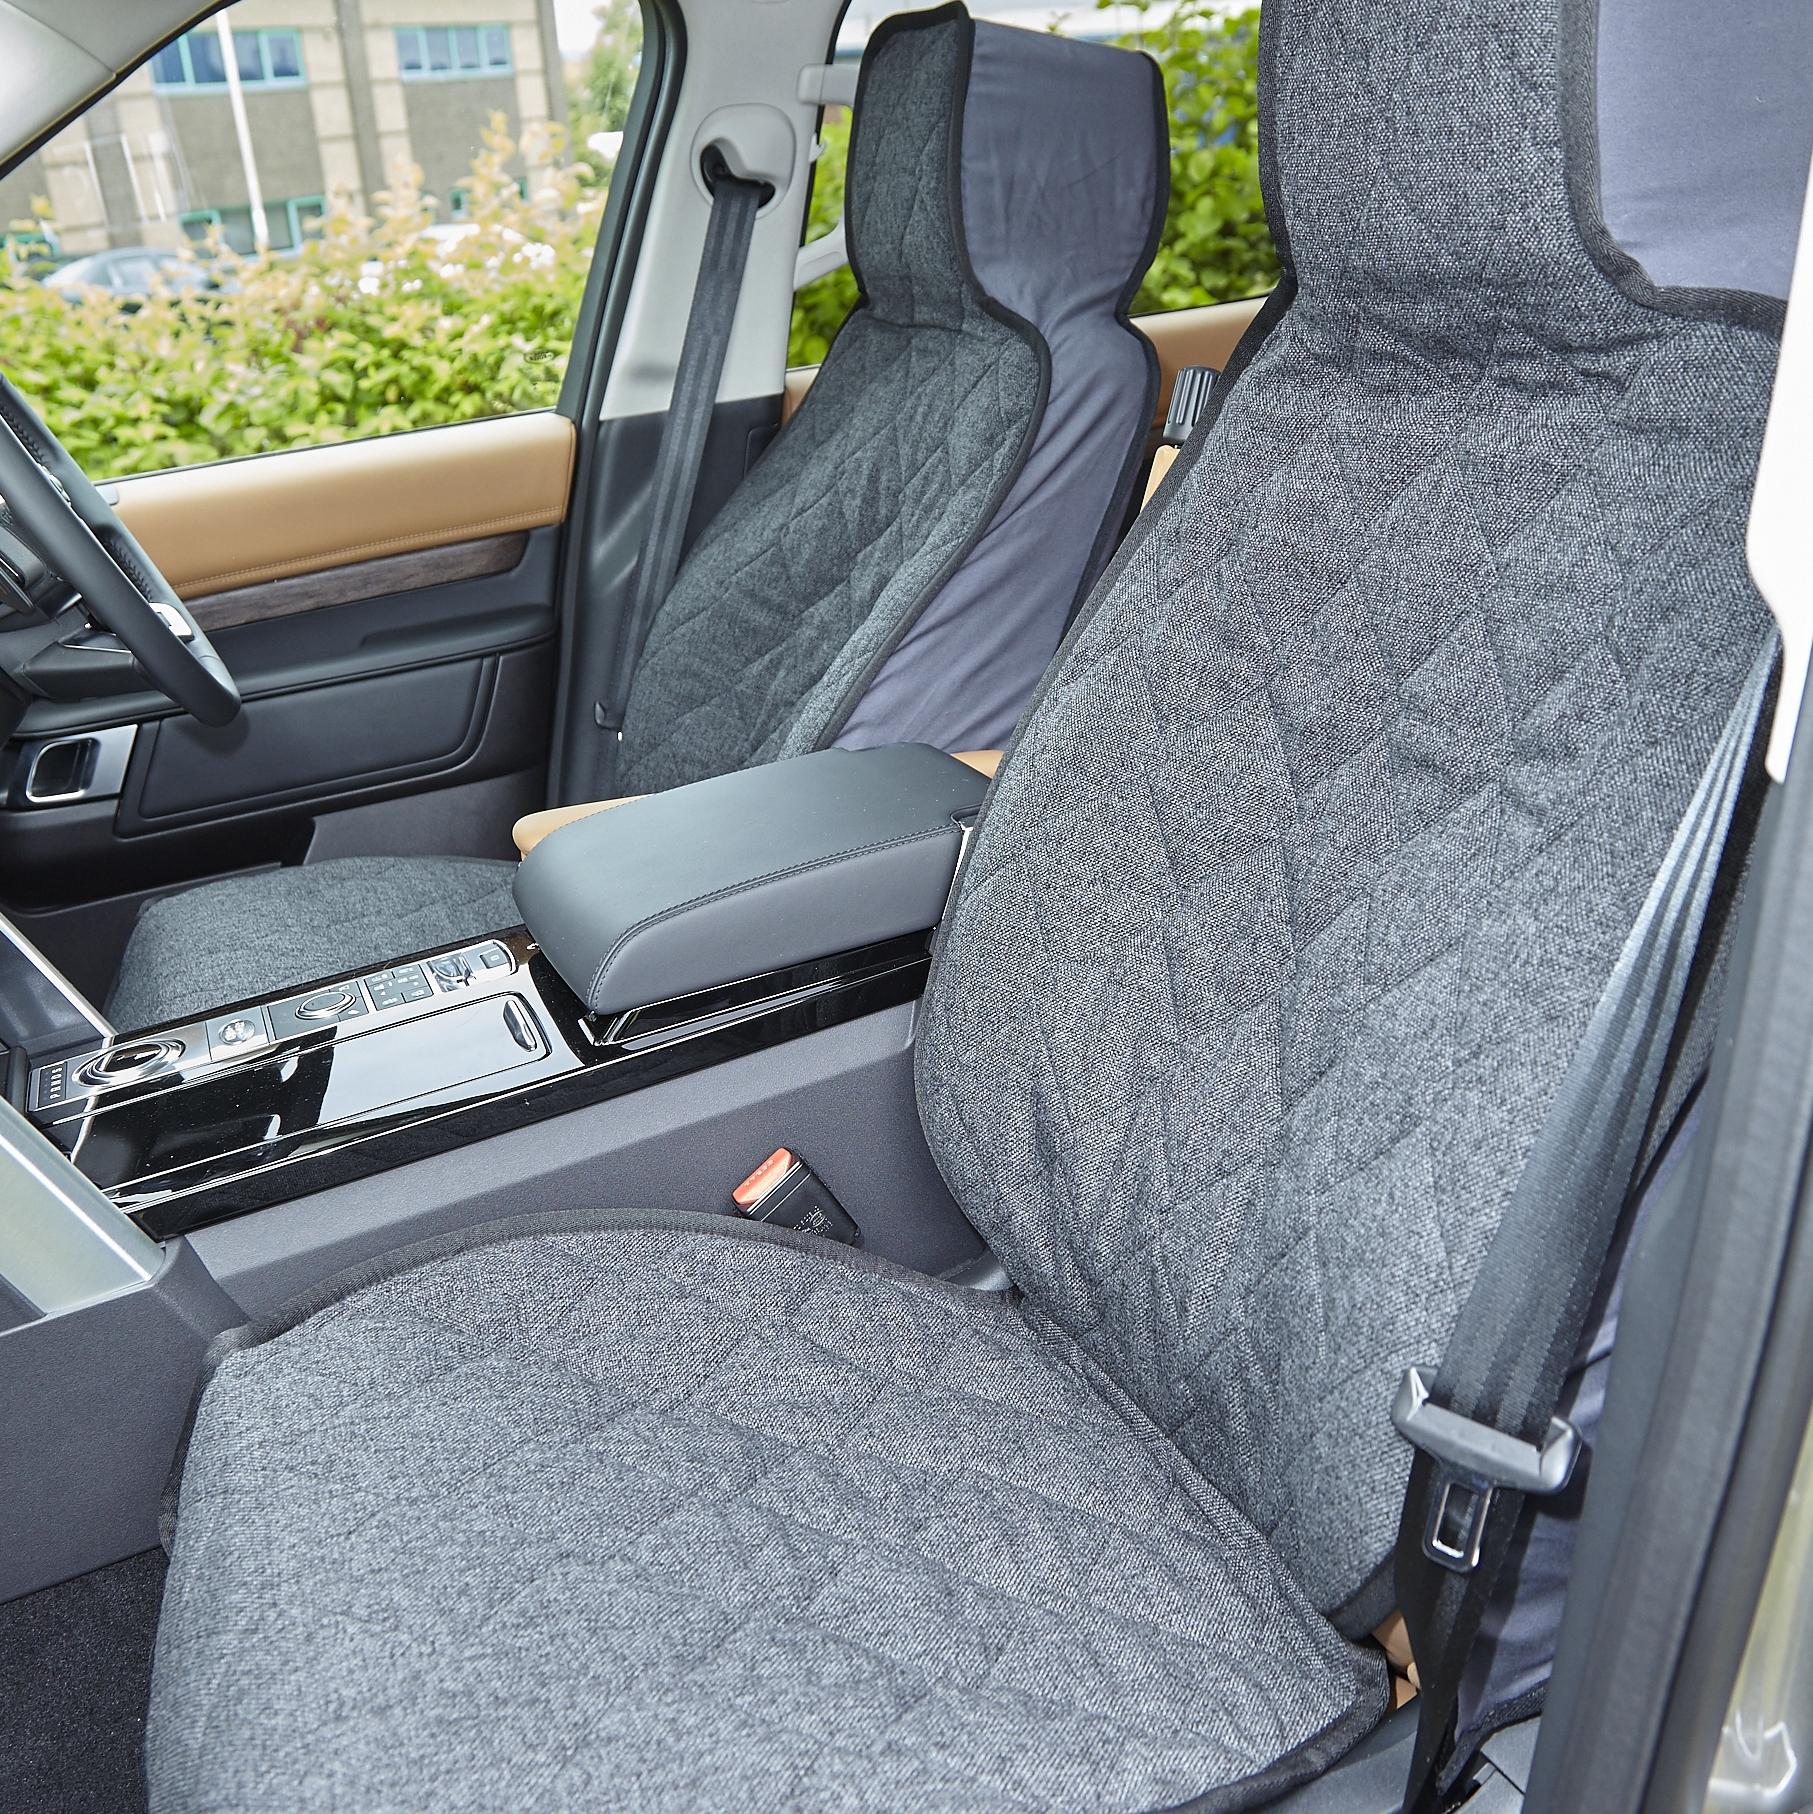 Onwards to fit Peugeot 5008 2017 Black Titan Waterproof Car Back Seat Cover